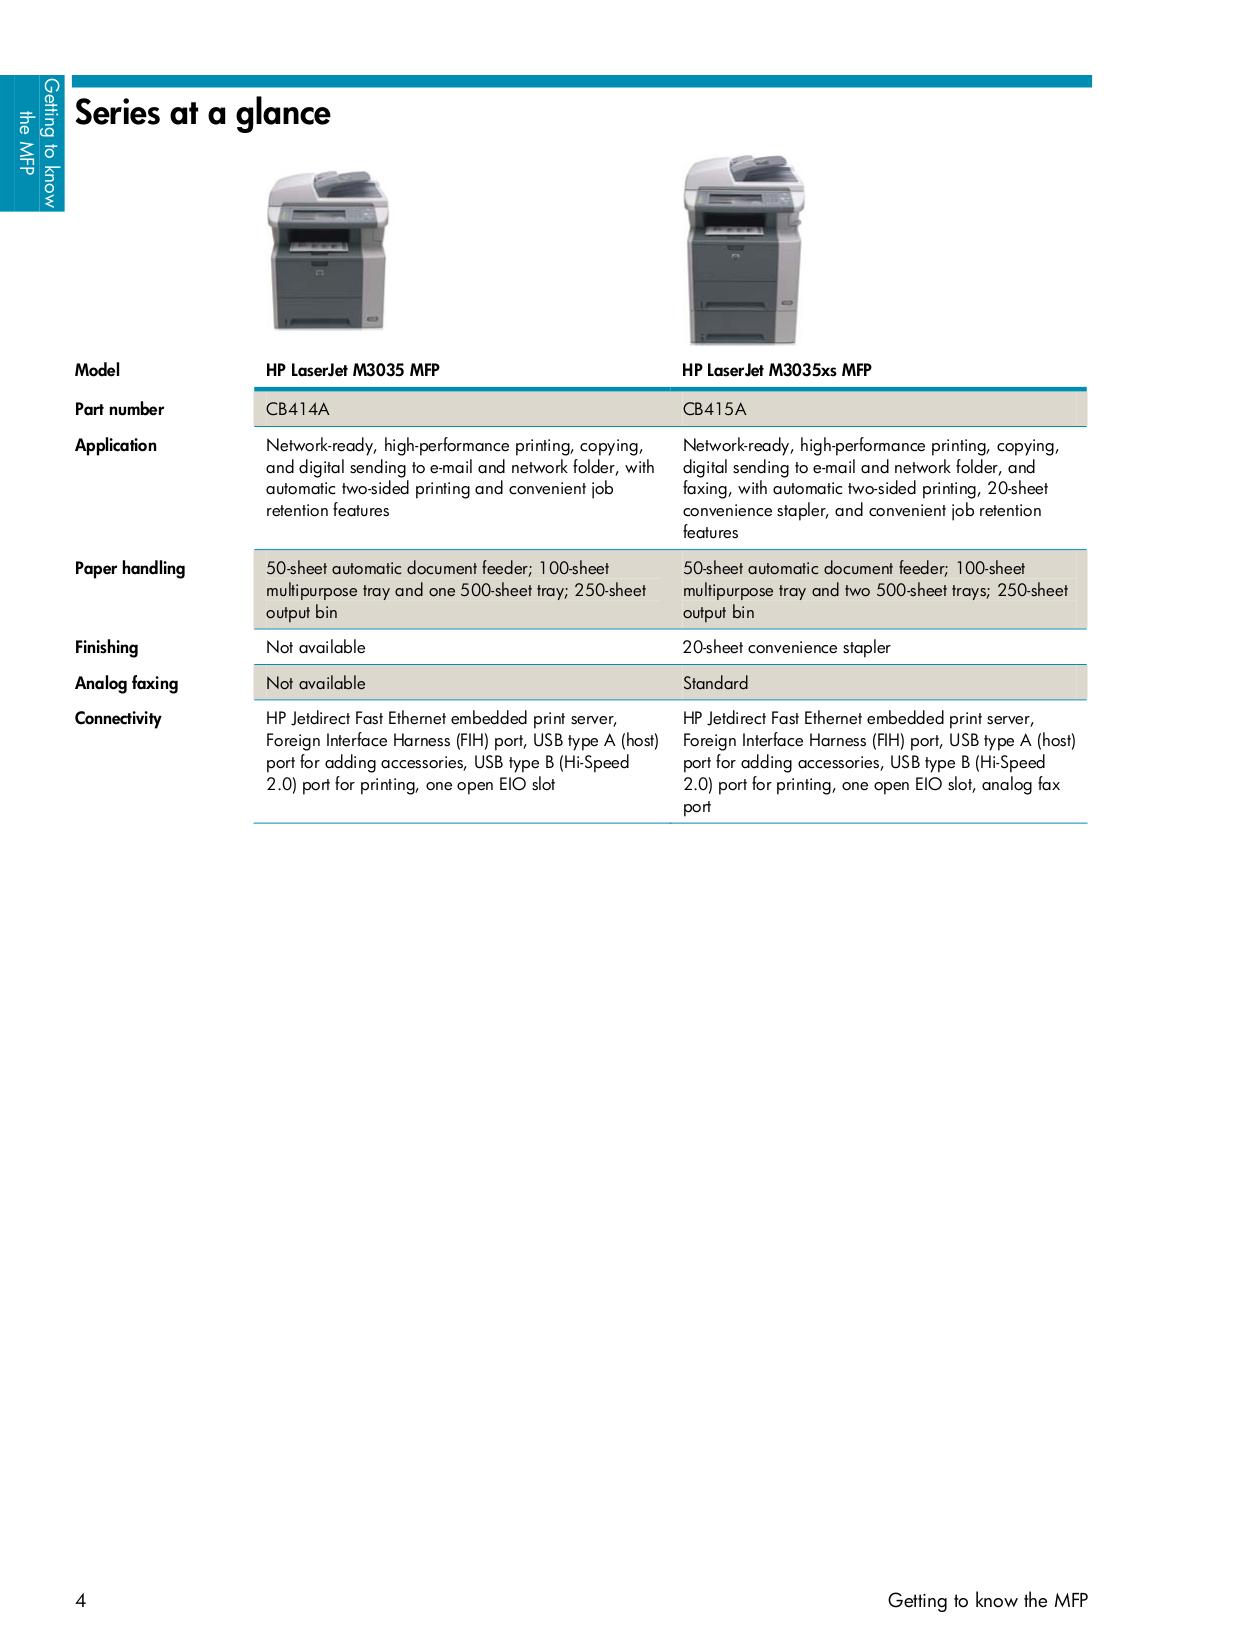 PDF manual for HP Multifunction Printer Laserjet,Color Laserjet M3035xs